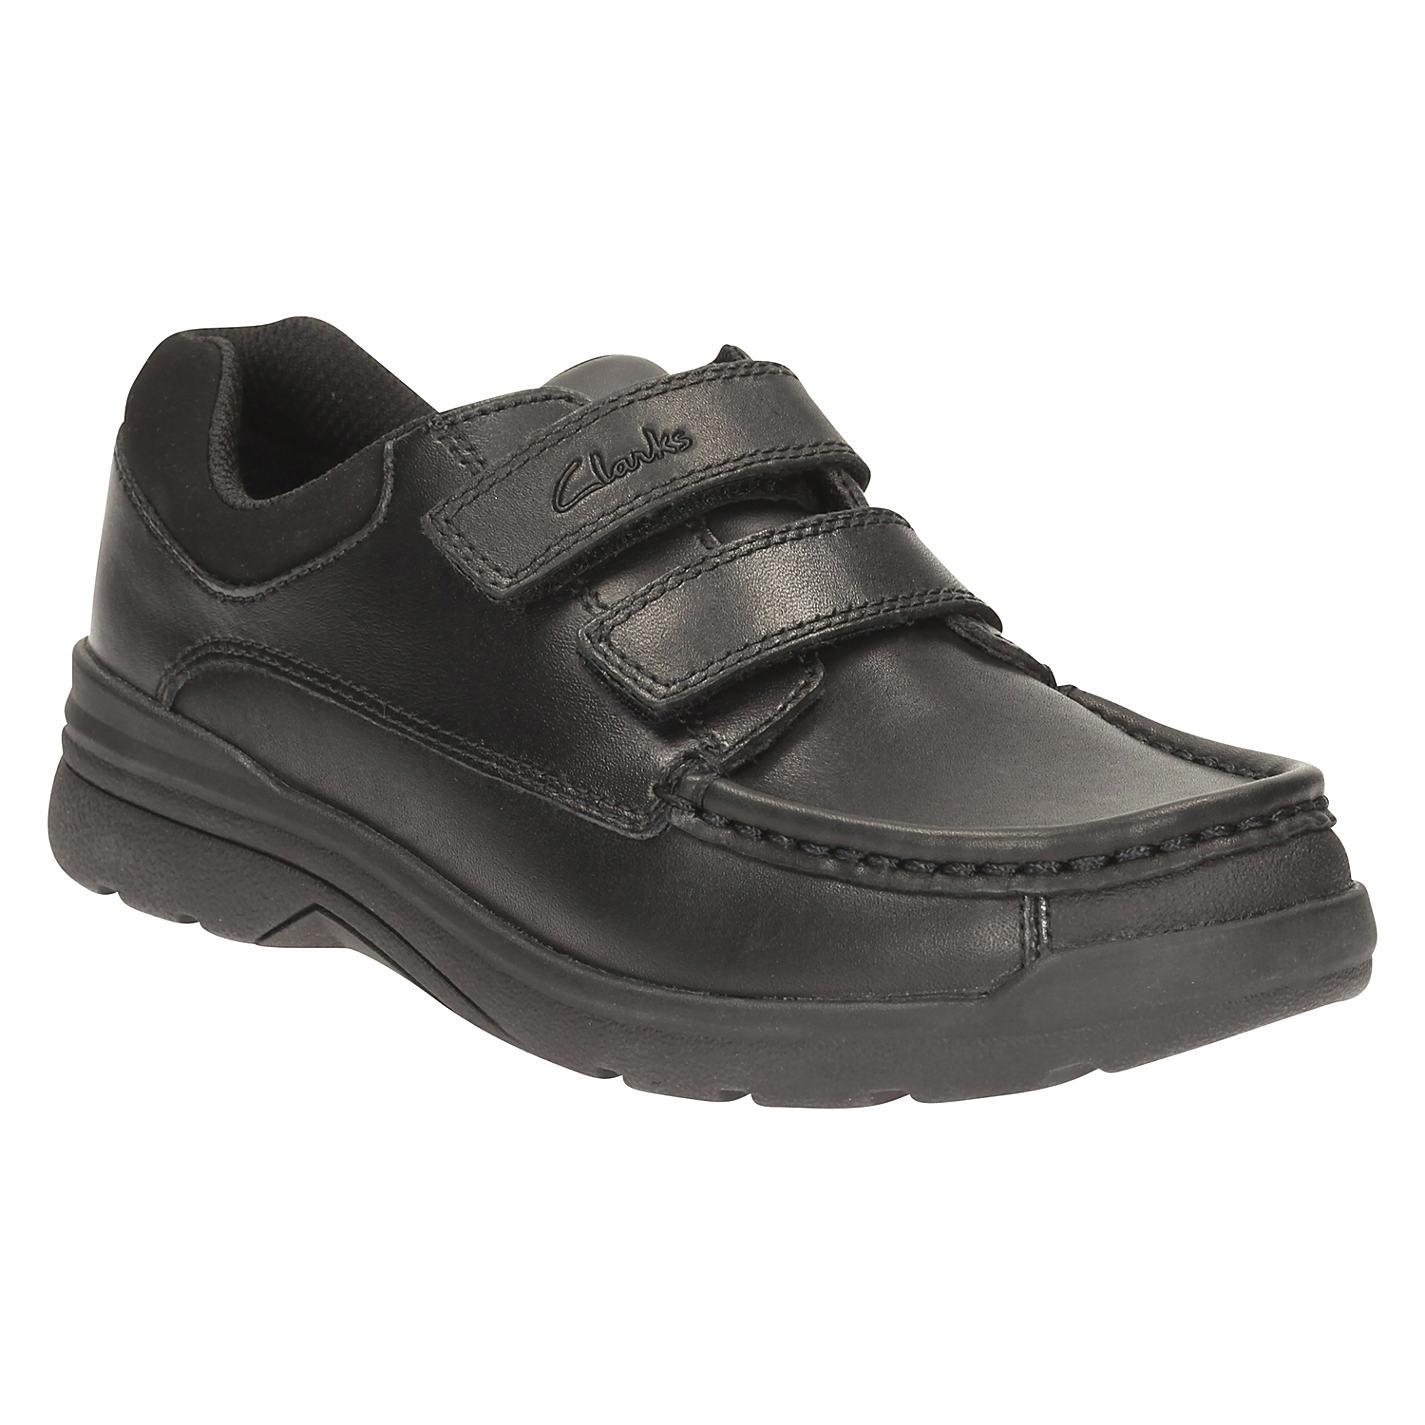 Clarks Kids Shoes London John Lewis